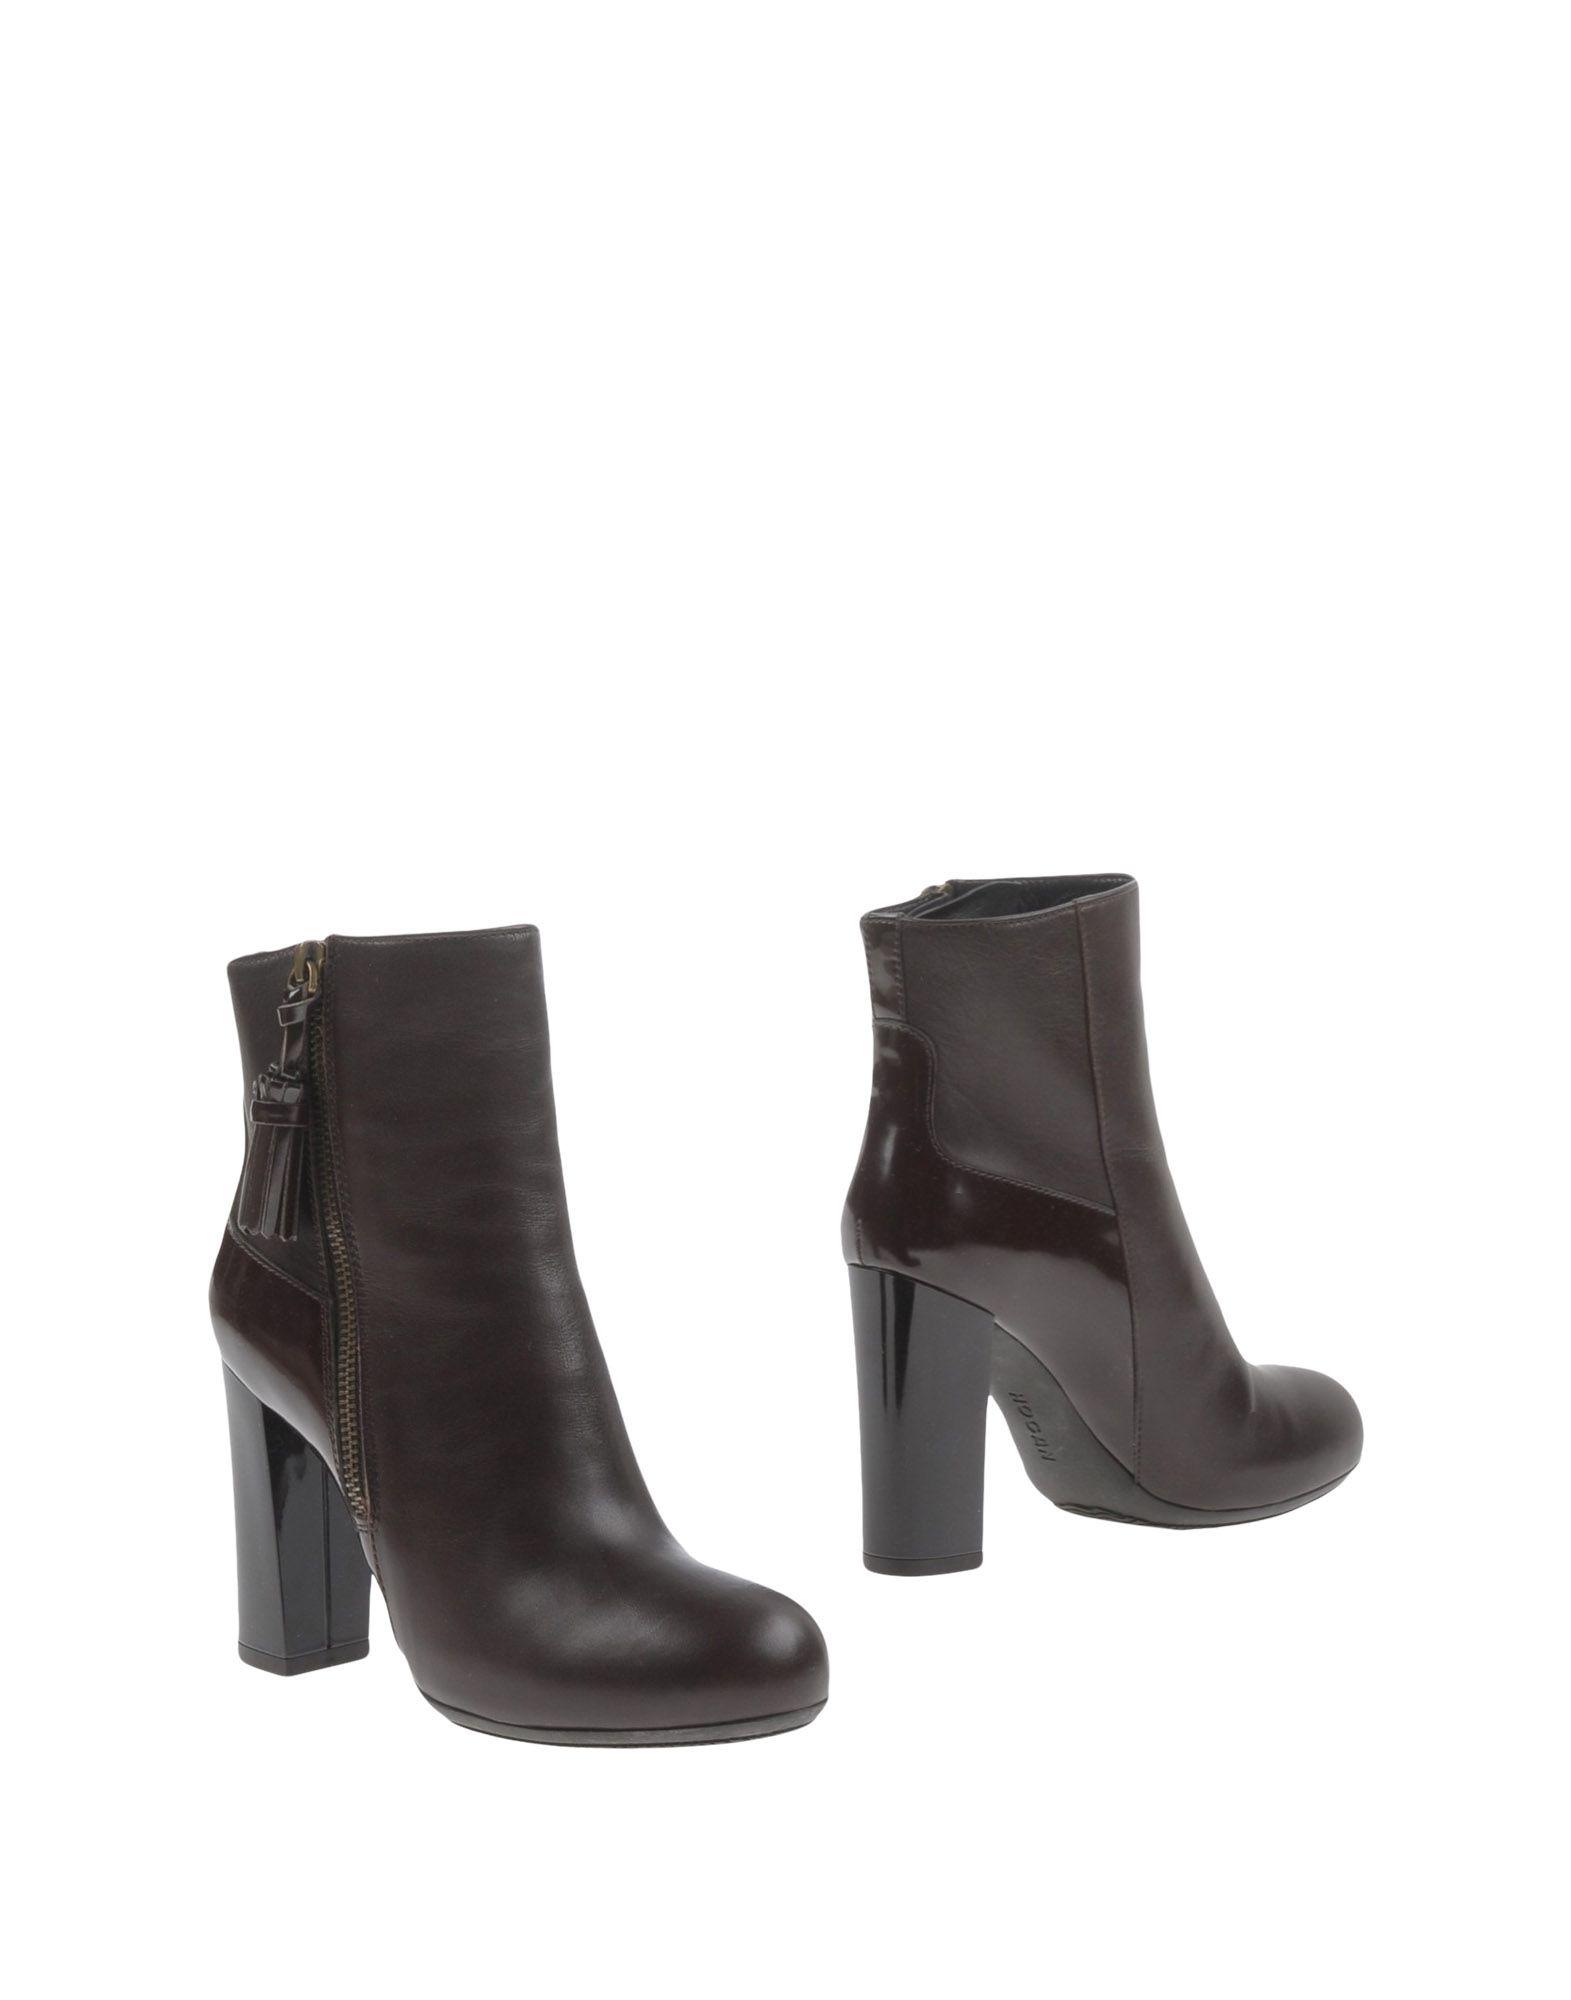 Hogan Ankle Boot - Women on Hogan Ankle Boots online on Women  United Kingdom - 11036717QI 22edcc